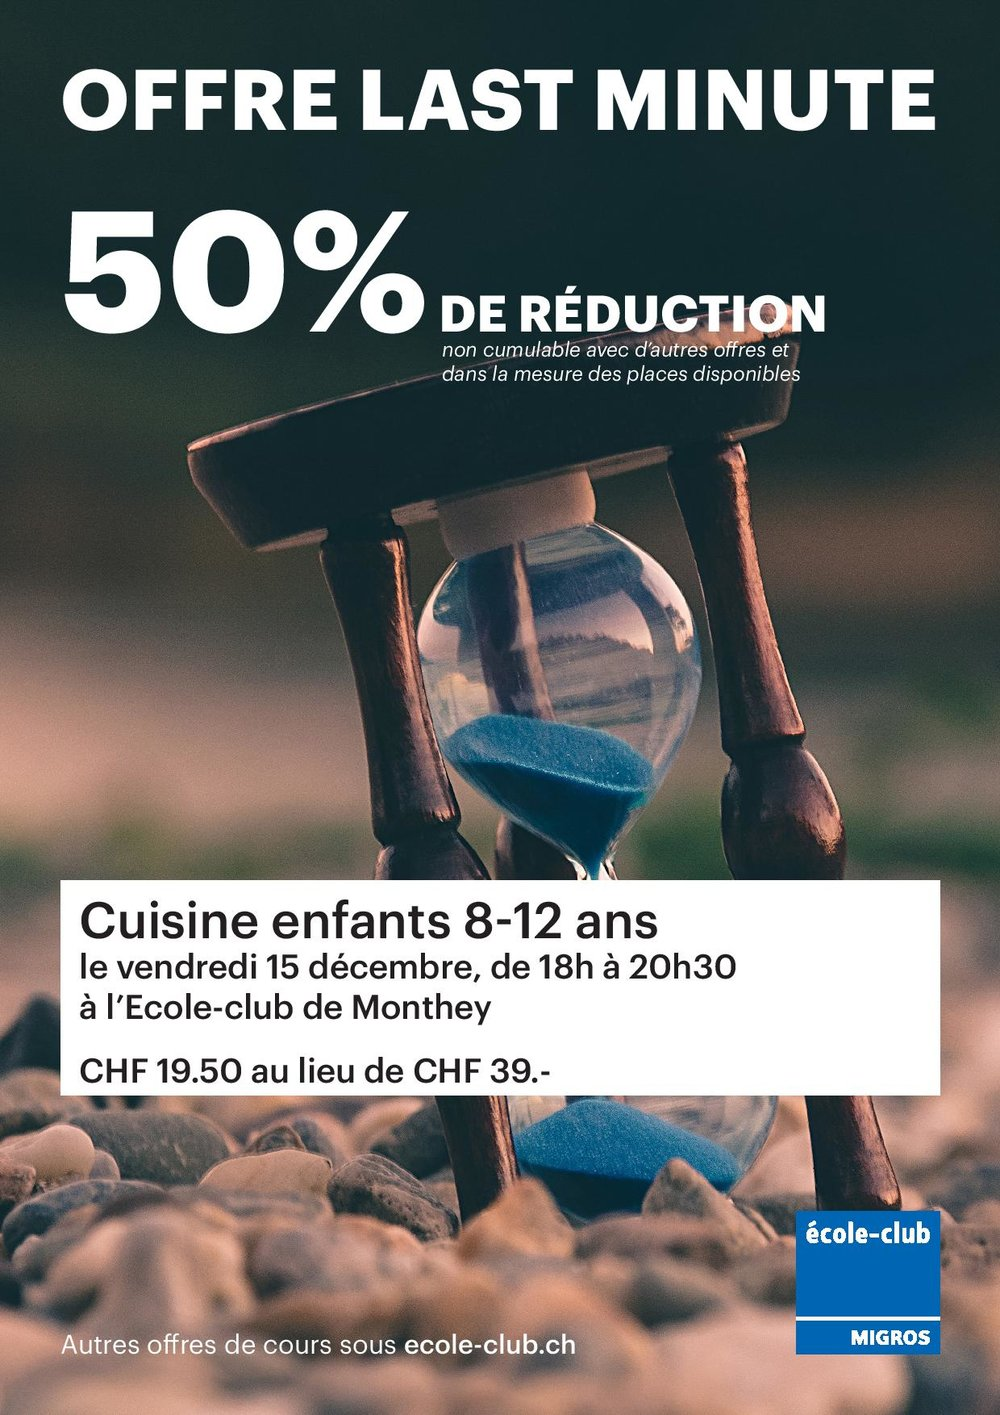 Last minute_Cuisine enfants_Mo-page-001.jpg